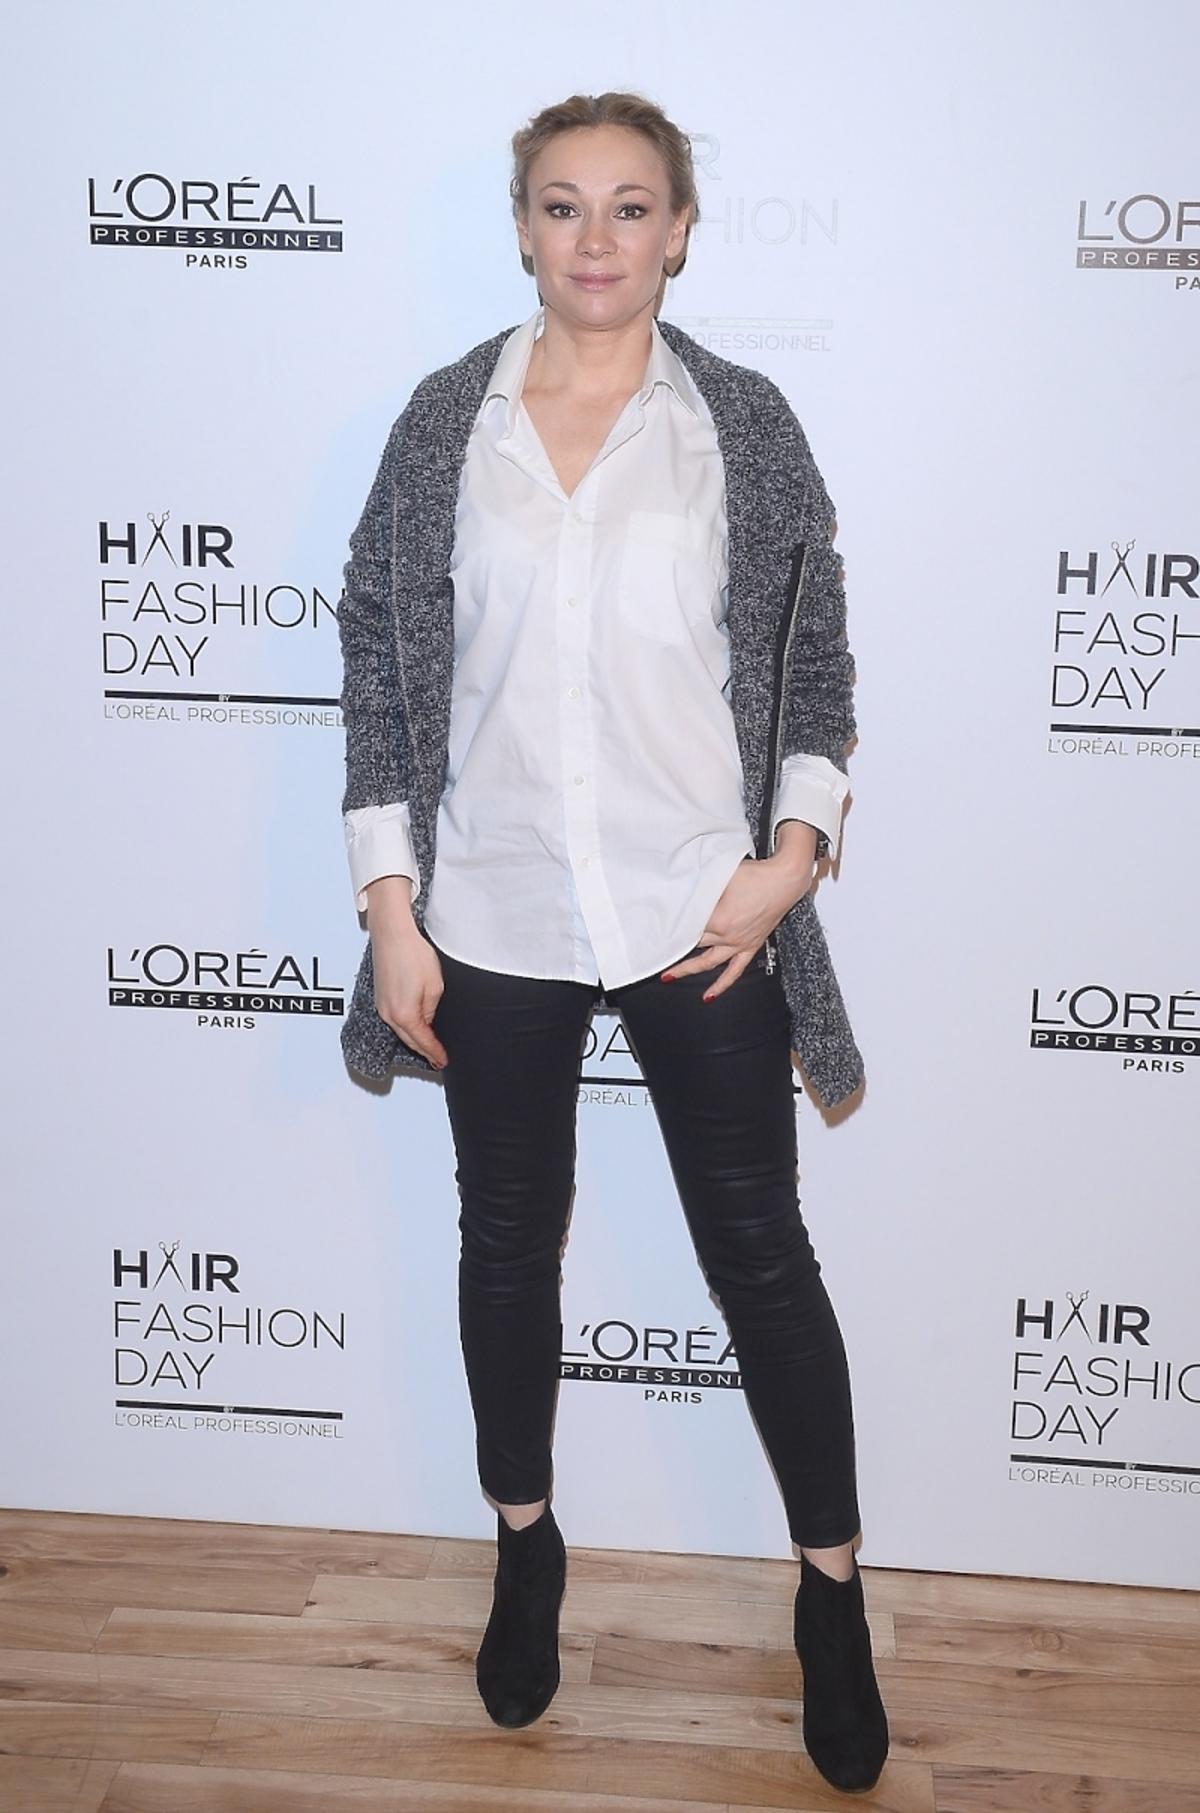 Sonia Bohosiewicz na Hair Fashion Day L Oreal Professionnel